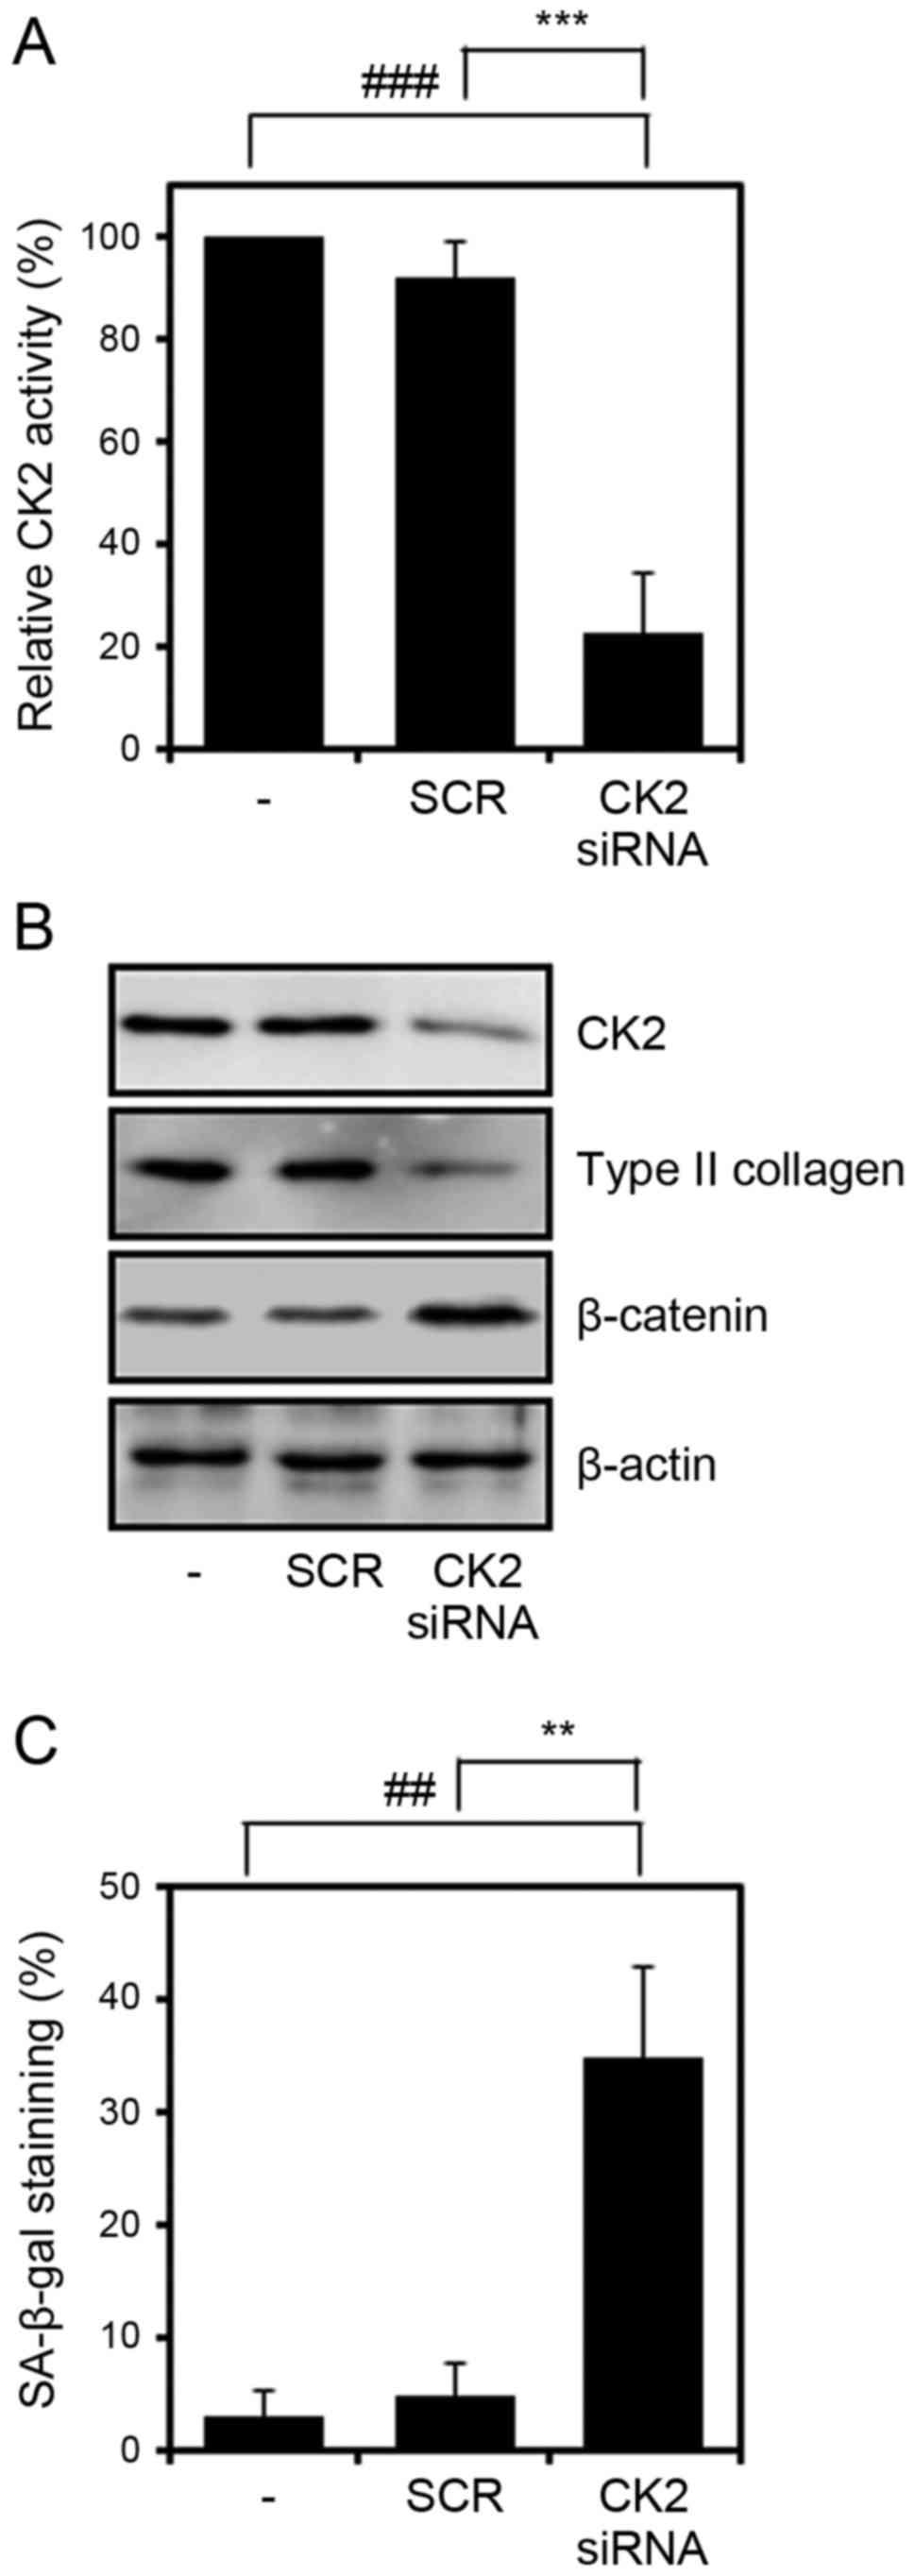 Inhibition of protein kinase CK2 facilitates cellular senescence by